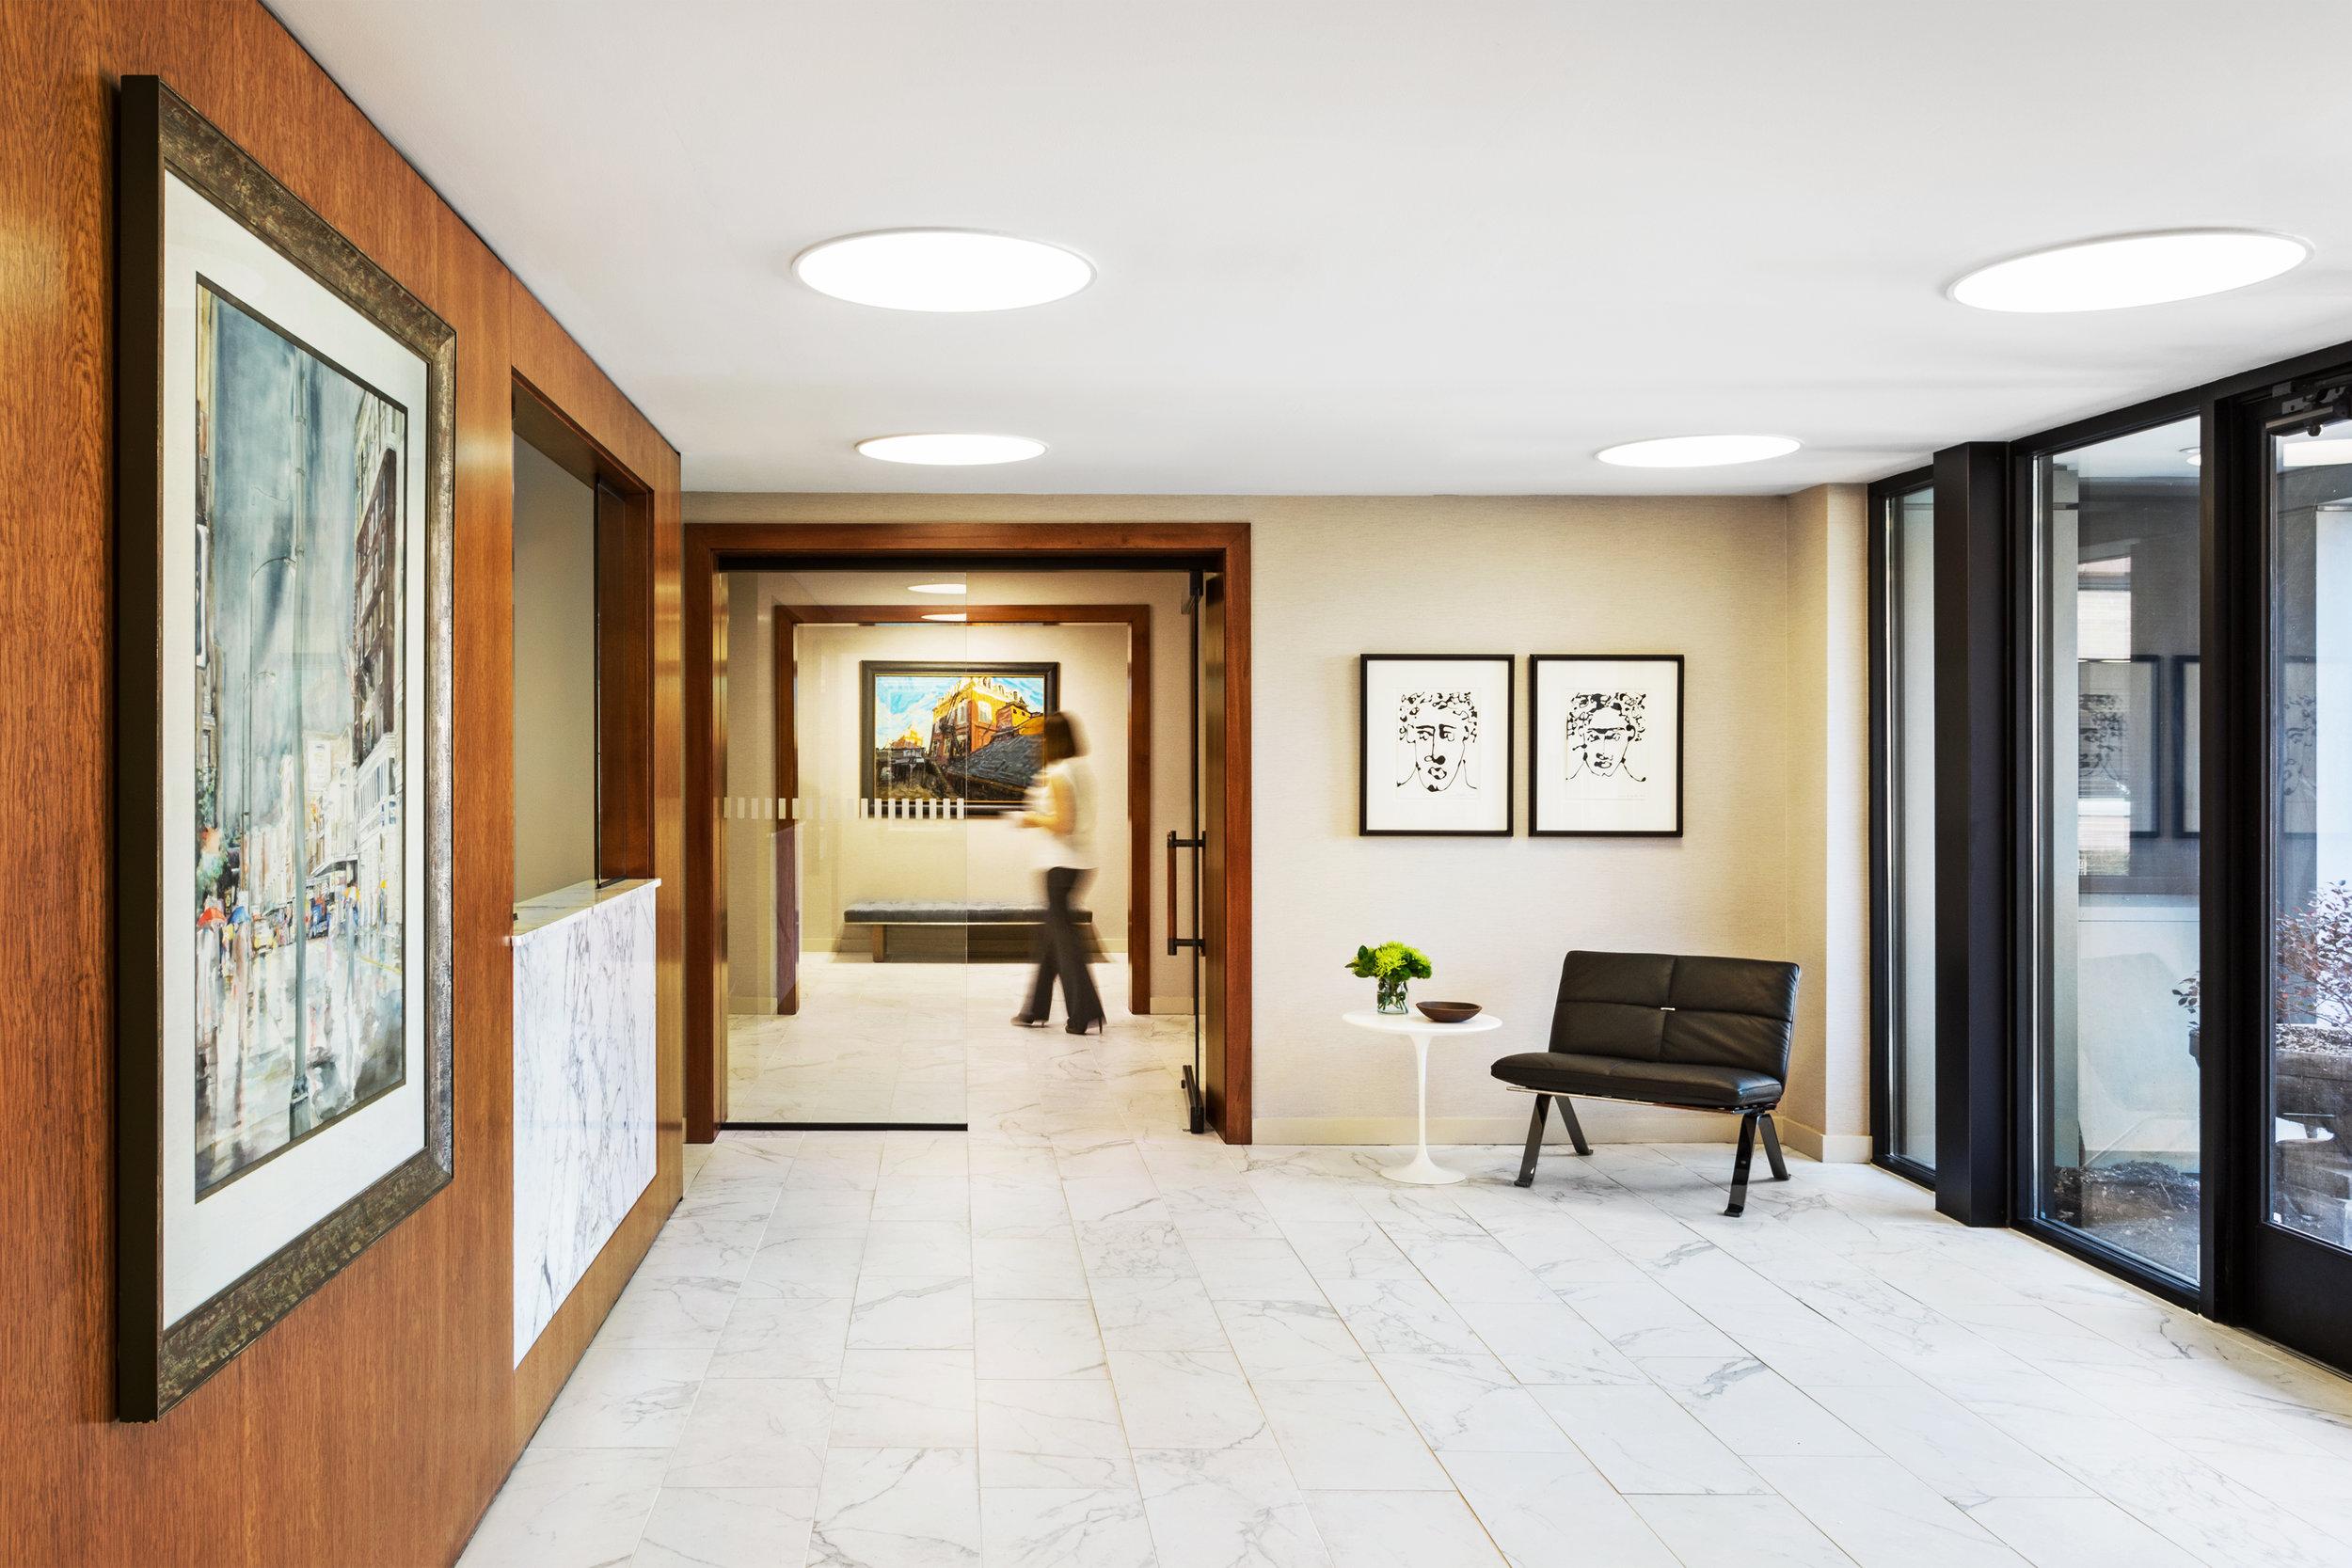 BSM_+Lawfirm_Lauderdalle_Design_group_knoxville_interior_design